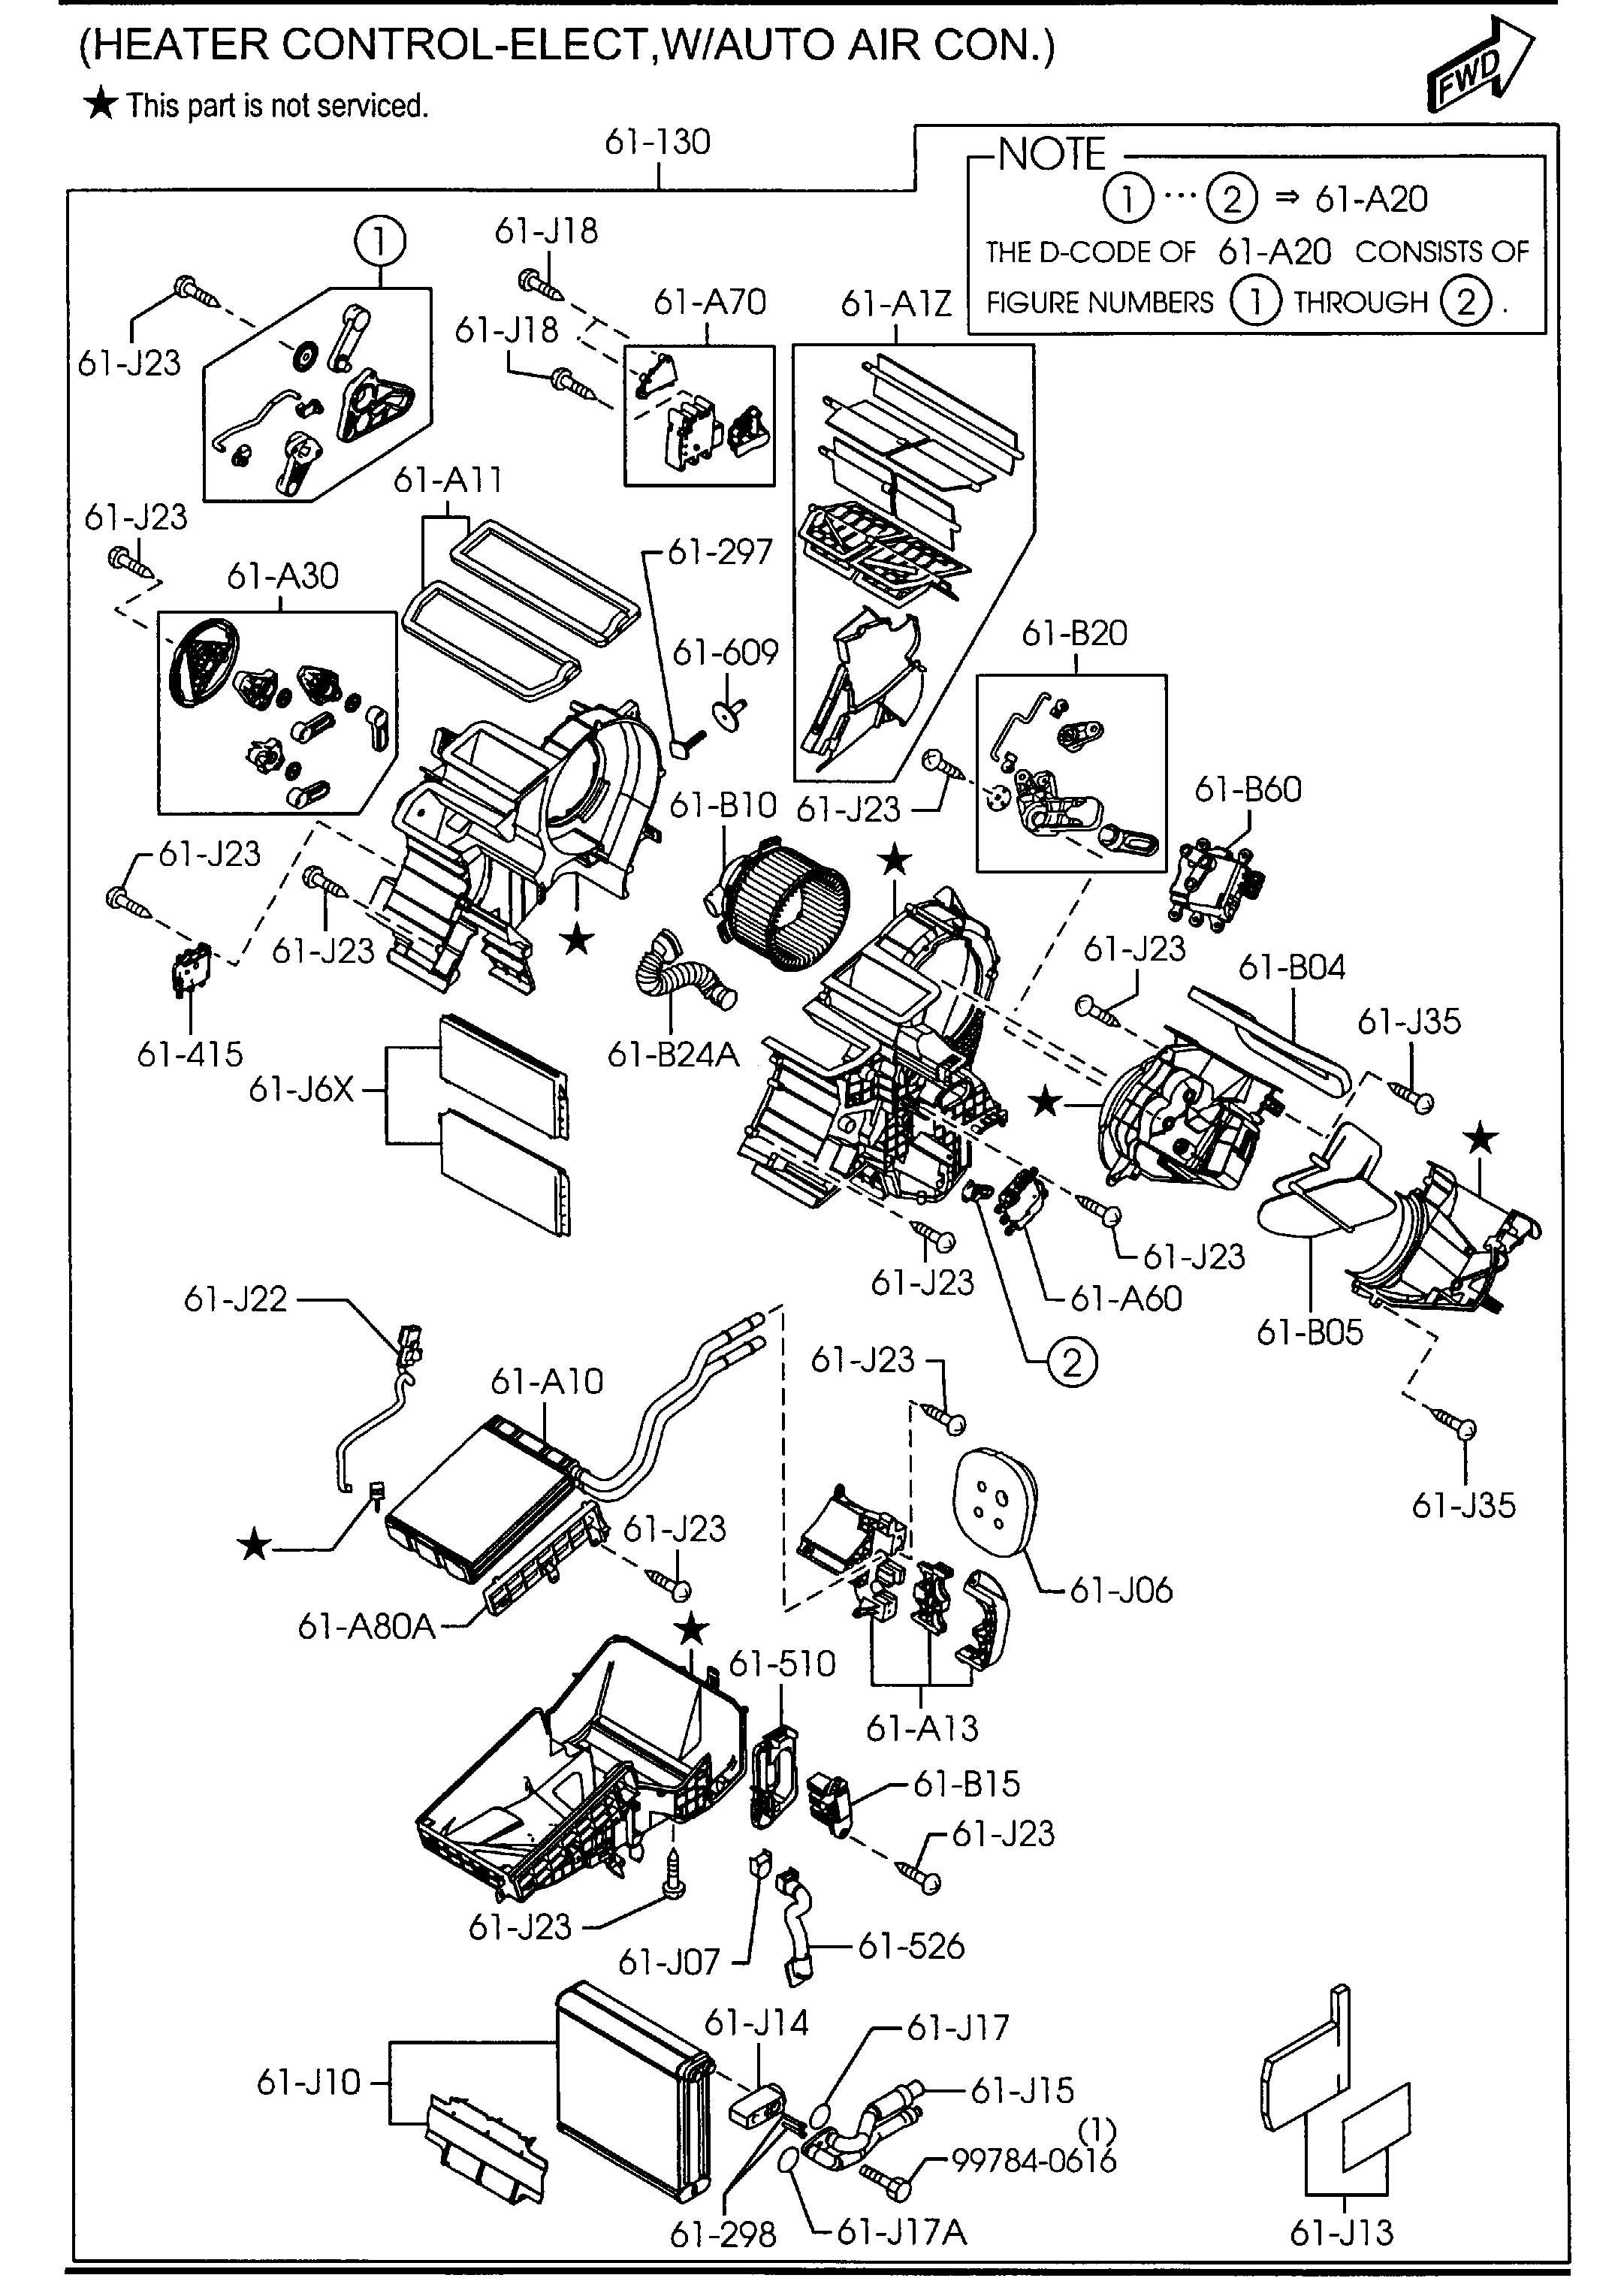 1999 Mazda B2500 Engine Diagram